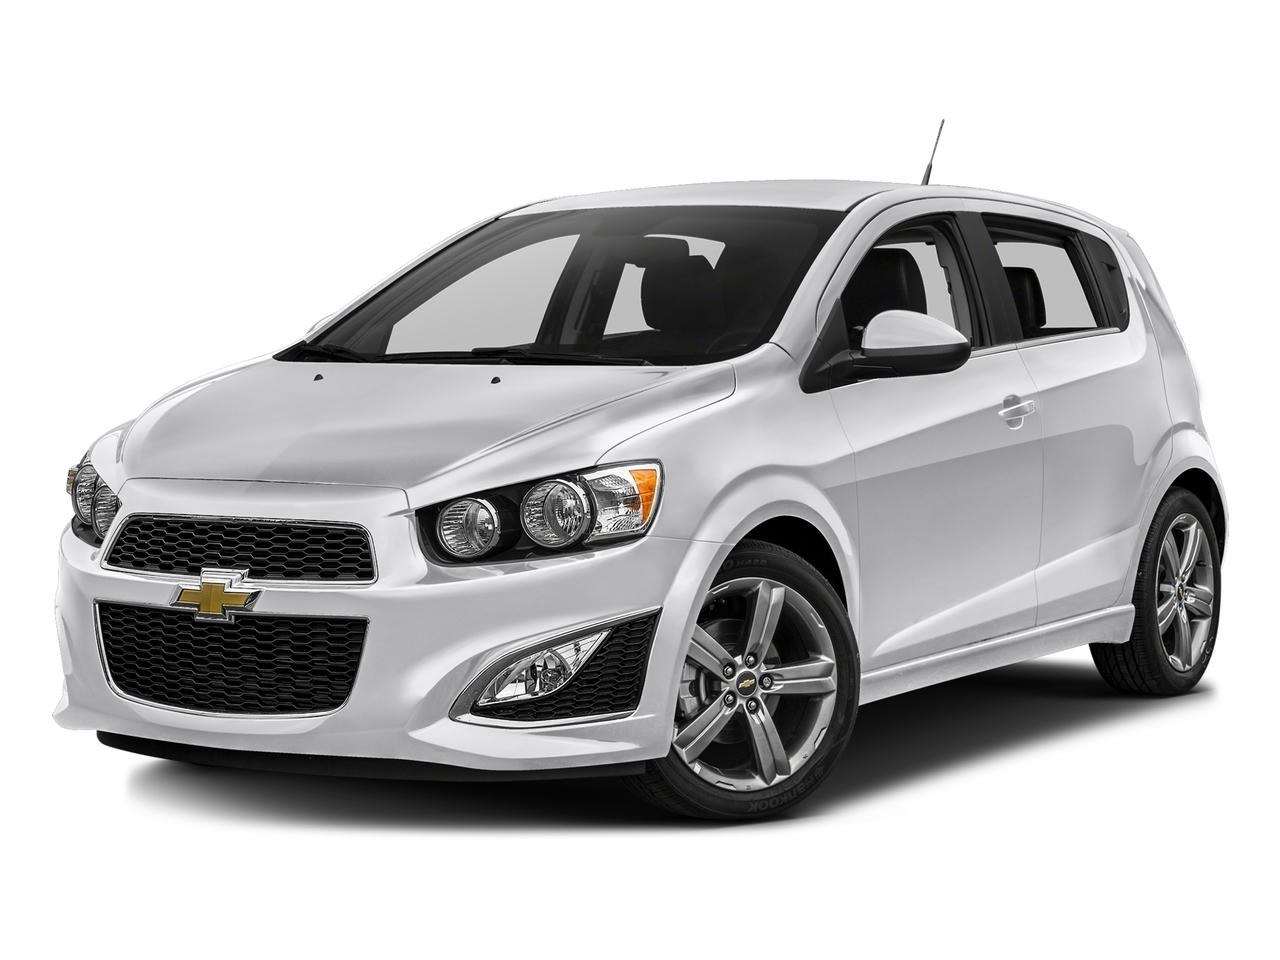 2016 Chevrolet Sonic Vehicle Photo in Tulsa, OK 74133